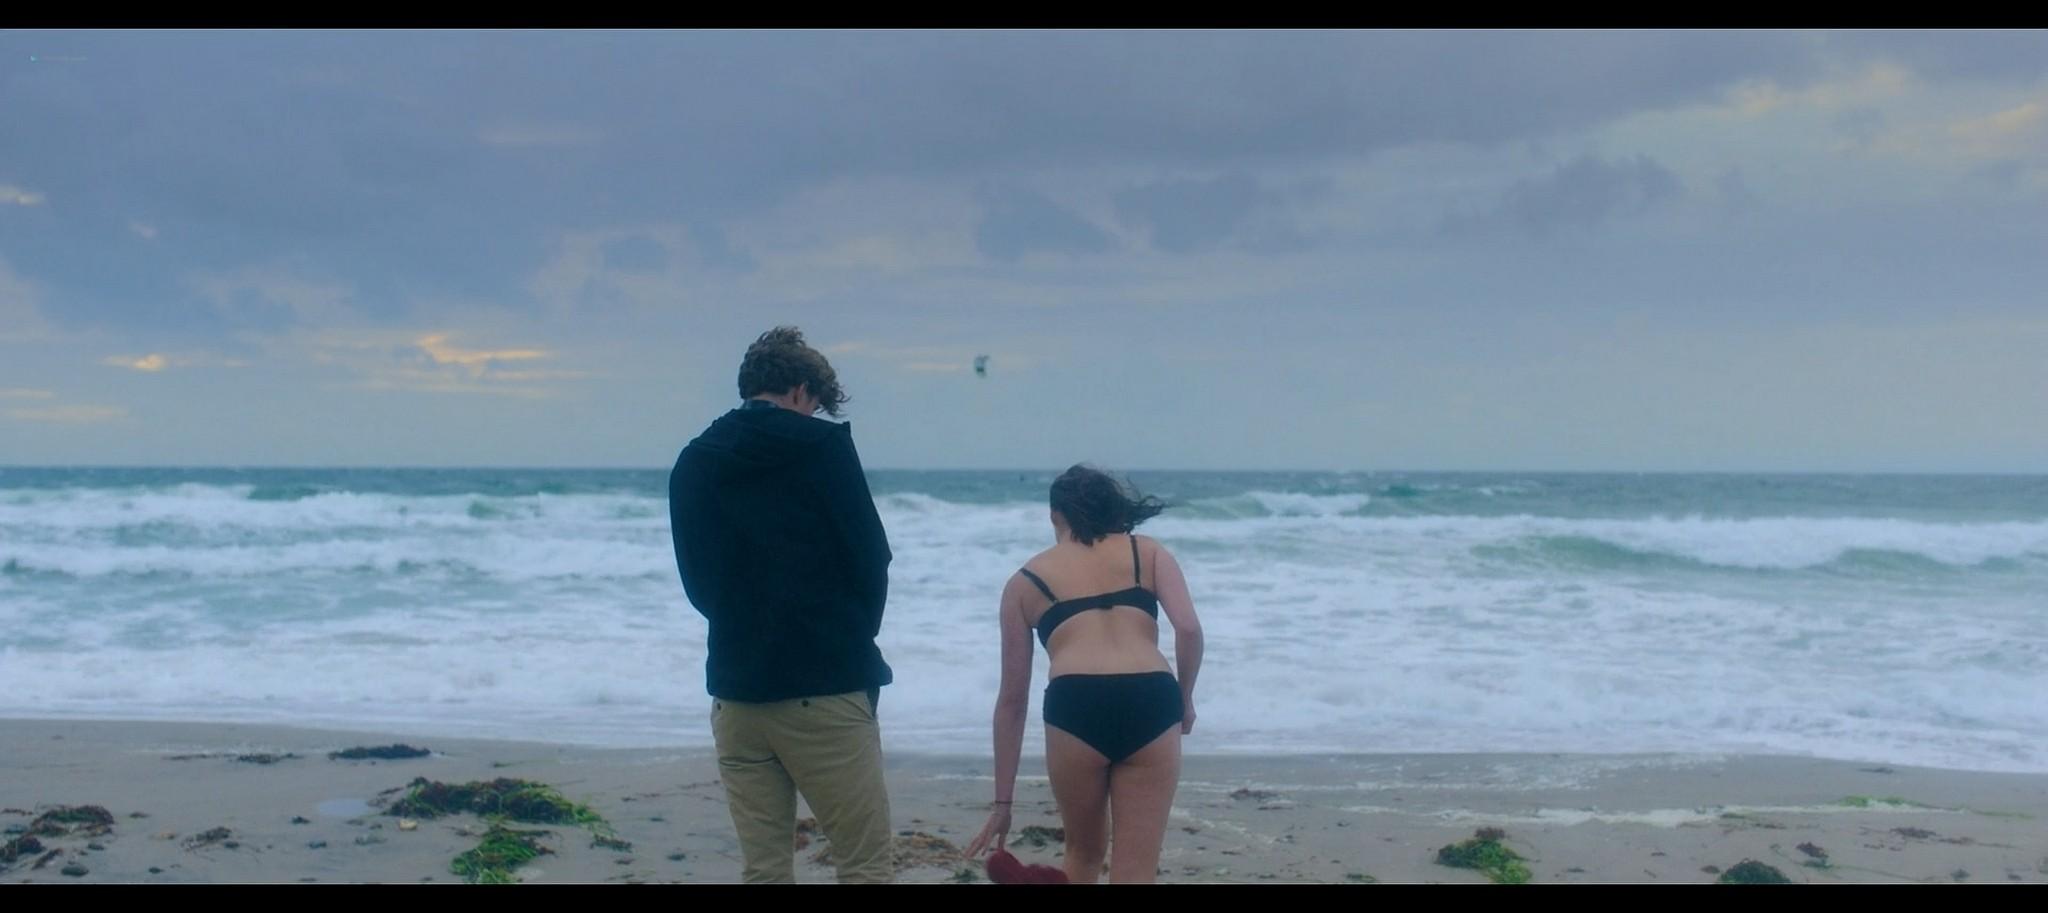 Julie Christiansen nude sex Marie Boda sexy While We Live DK 2017 1080p BluRay 2